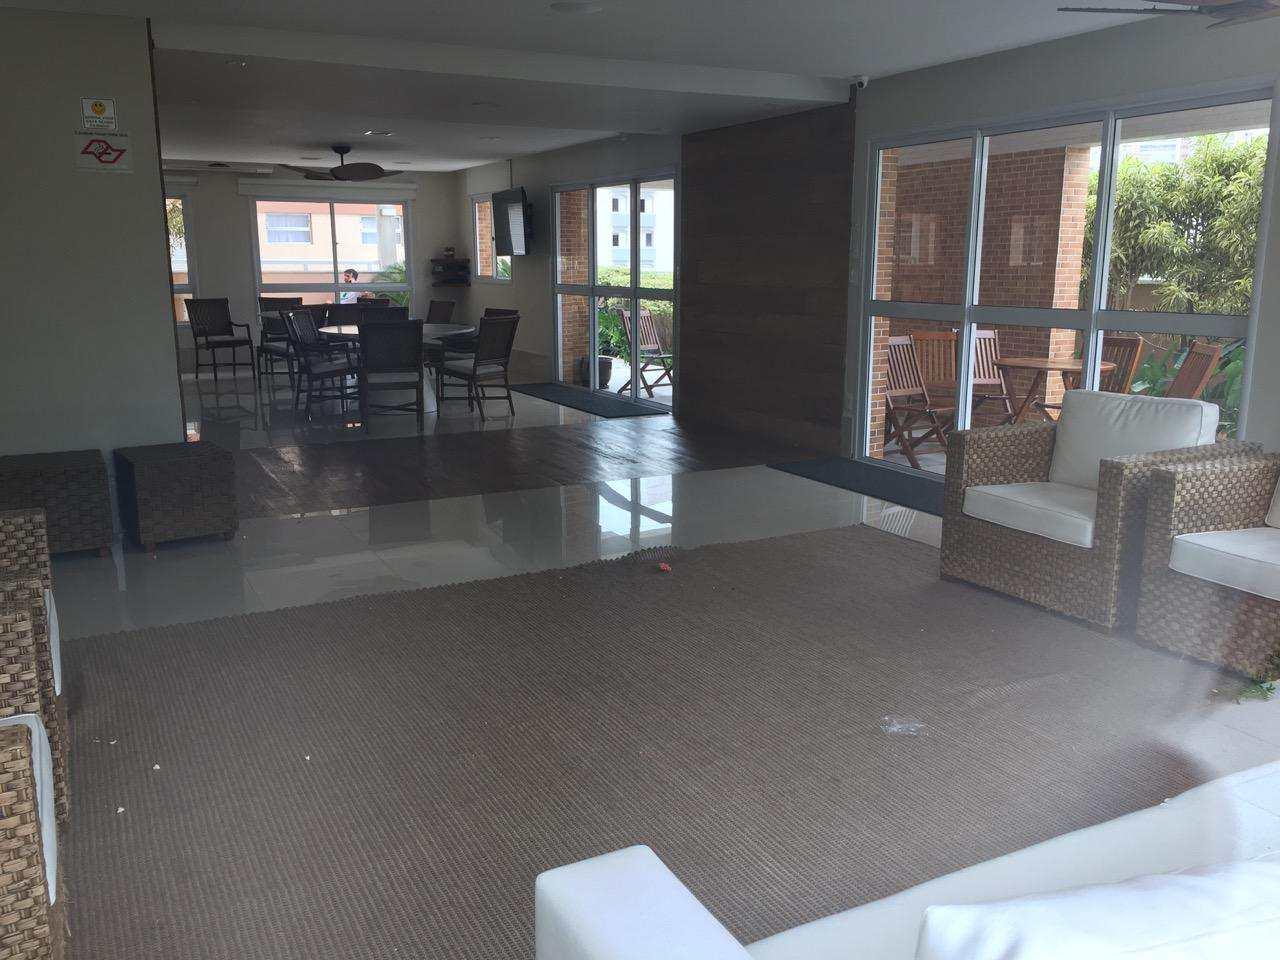 J - Areas de lazer do condominio  (6)